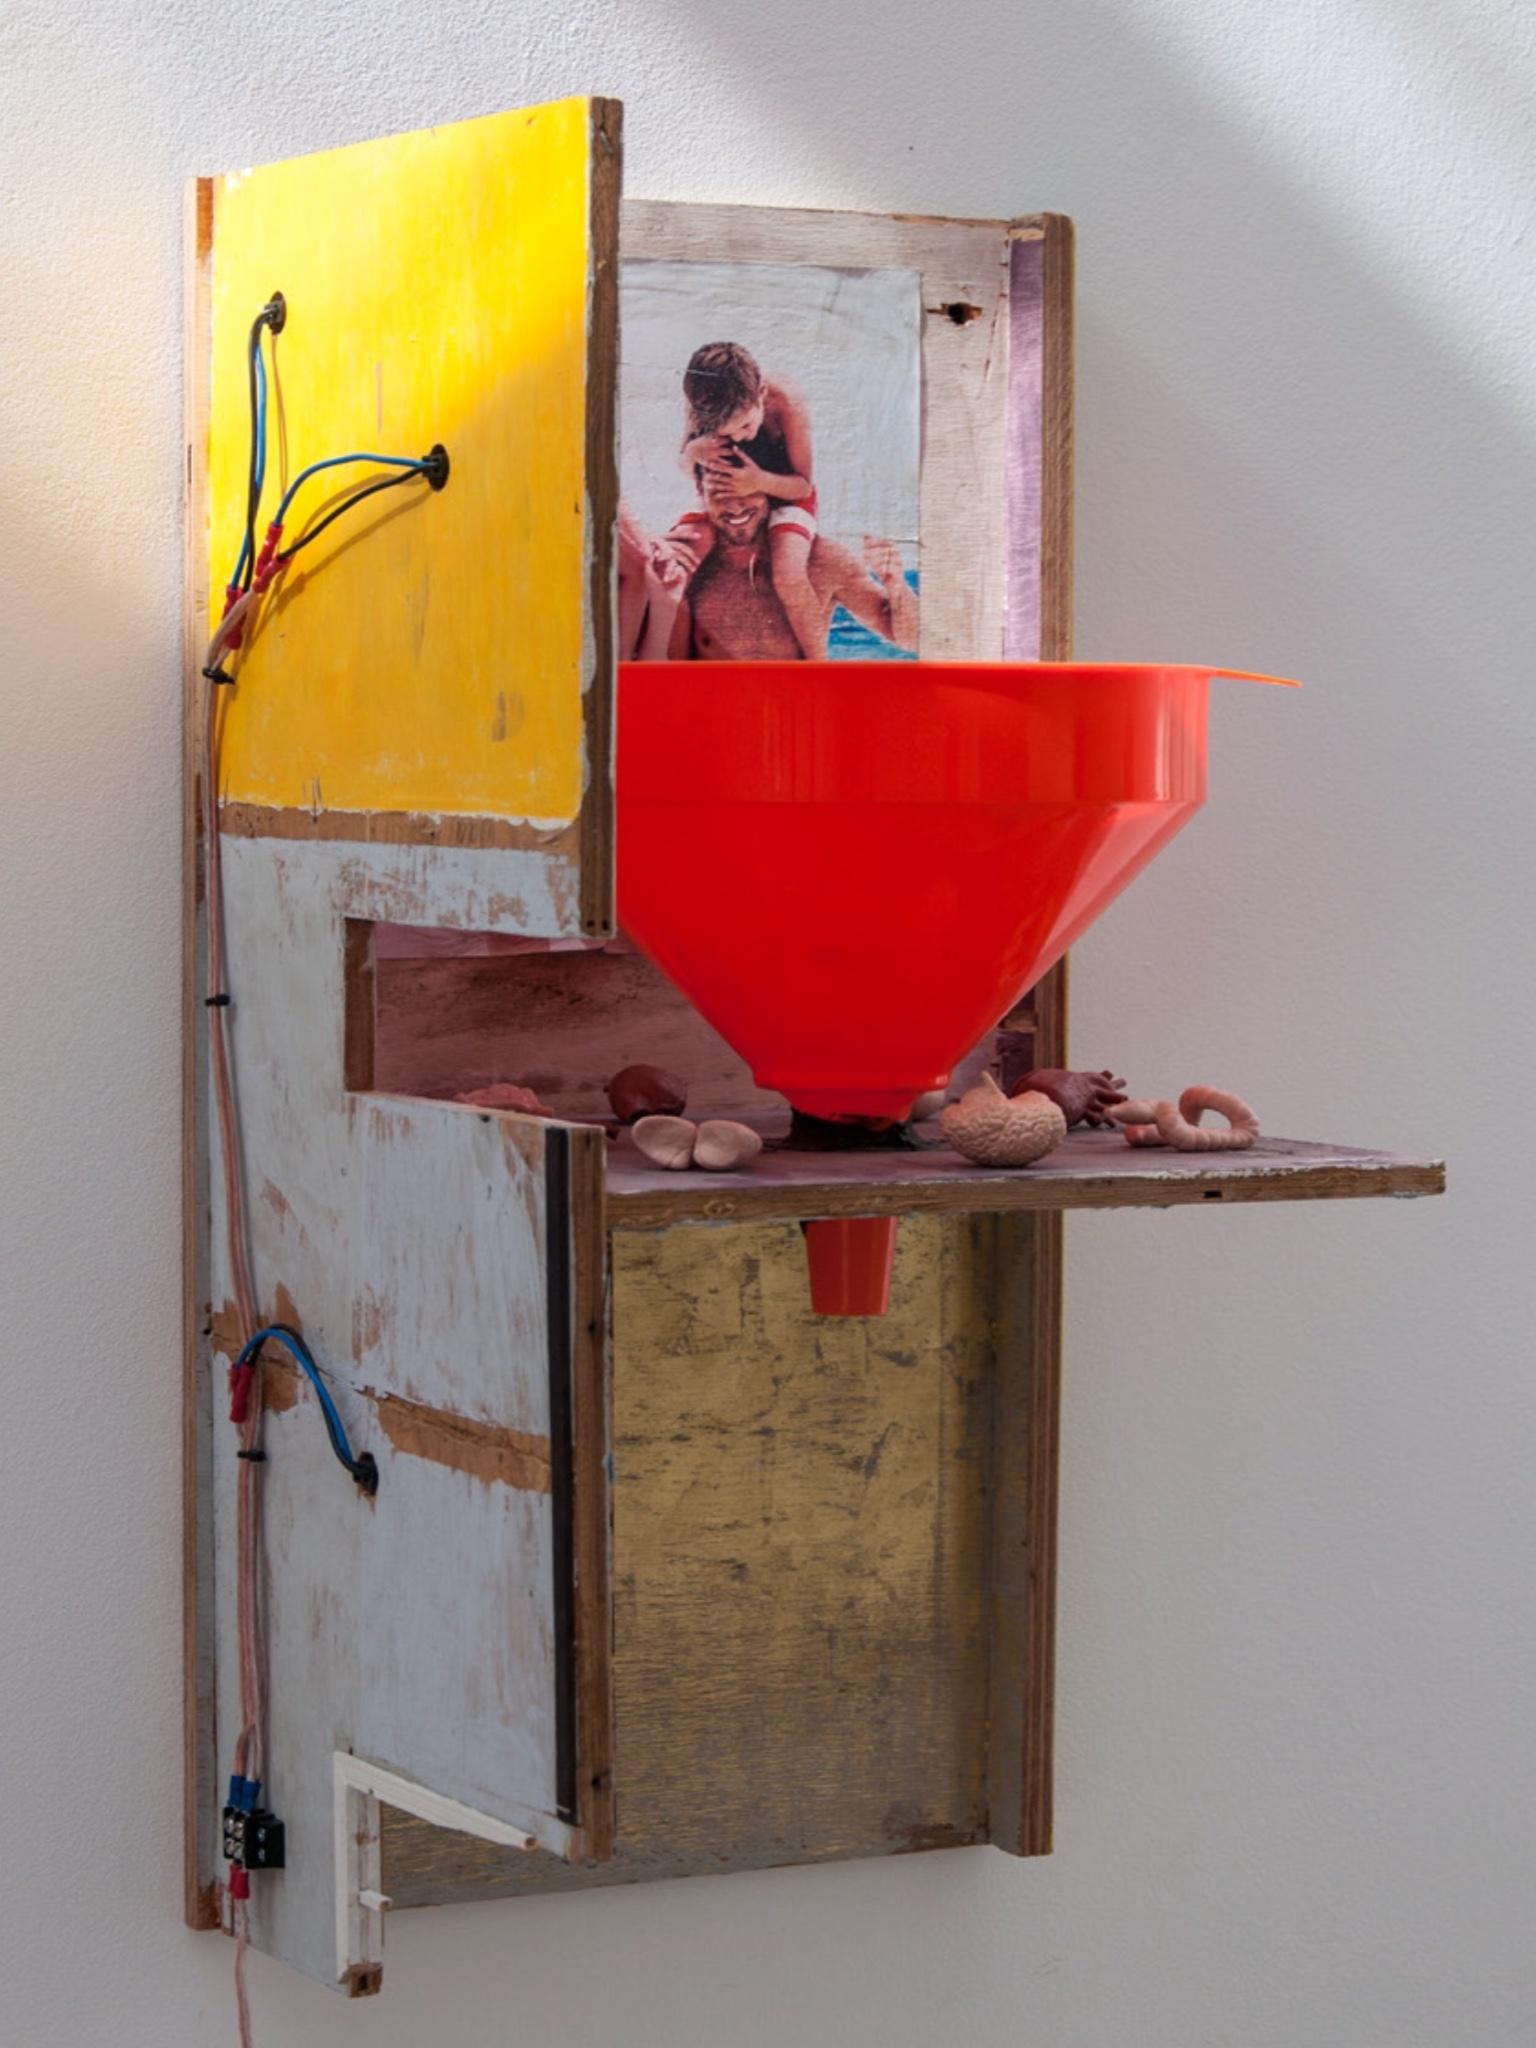 Mathis Altmann, house of grifters, 2016. Courtesy of Sébastien Peyret.